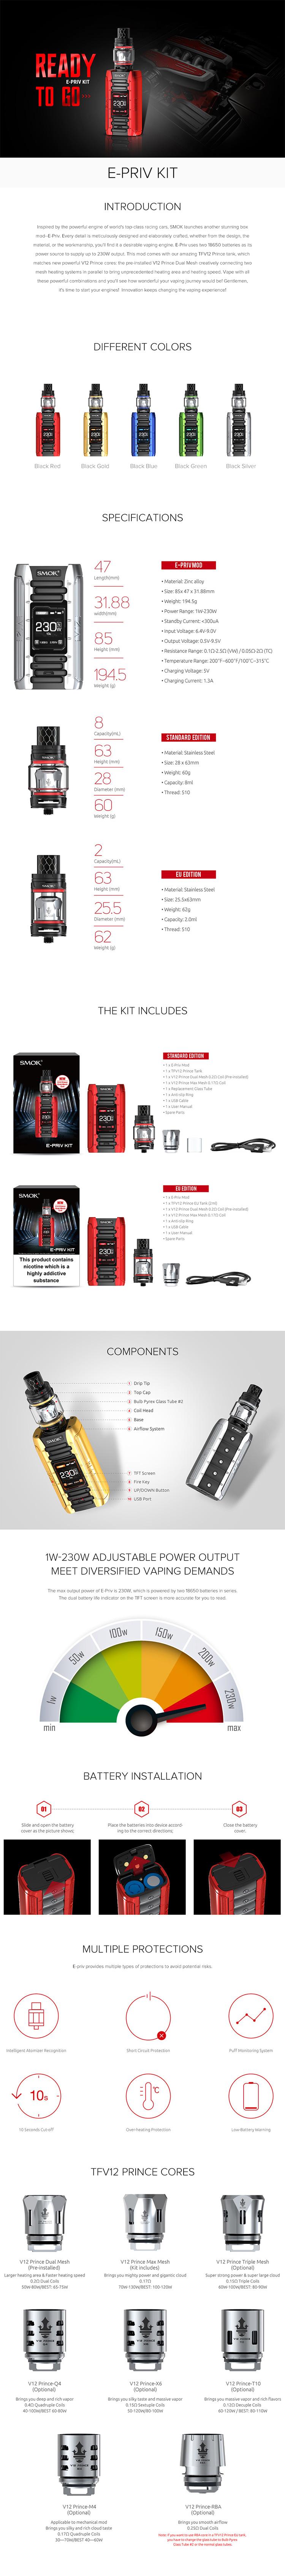 SMOK E-PRIV Kit